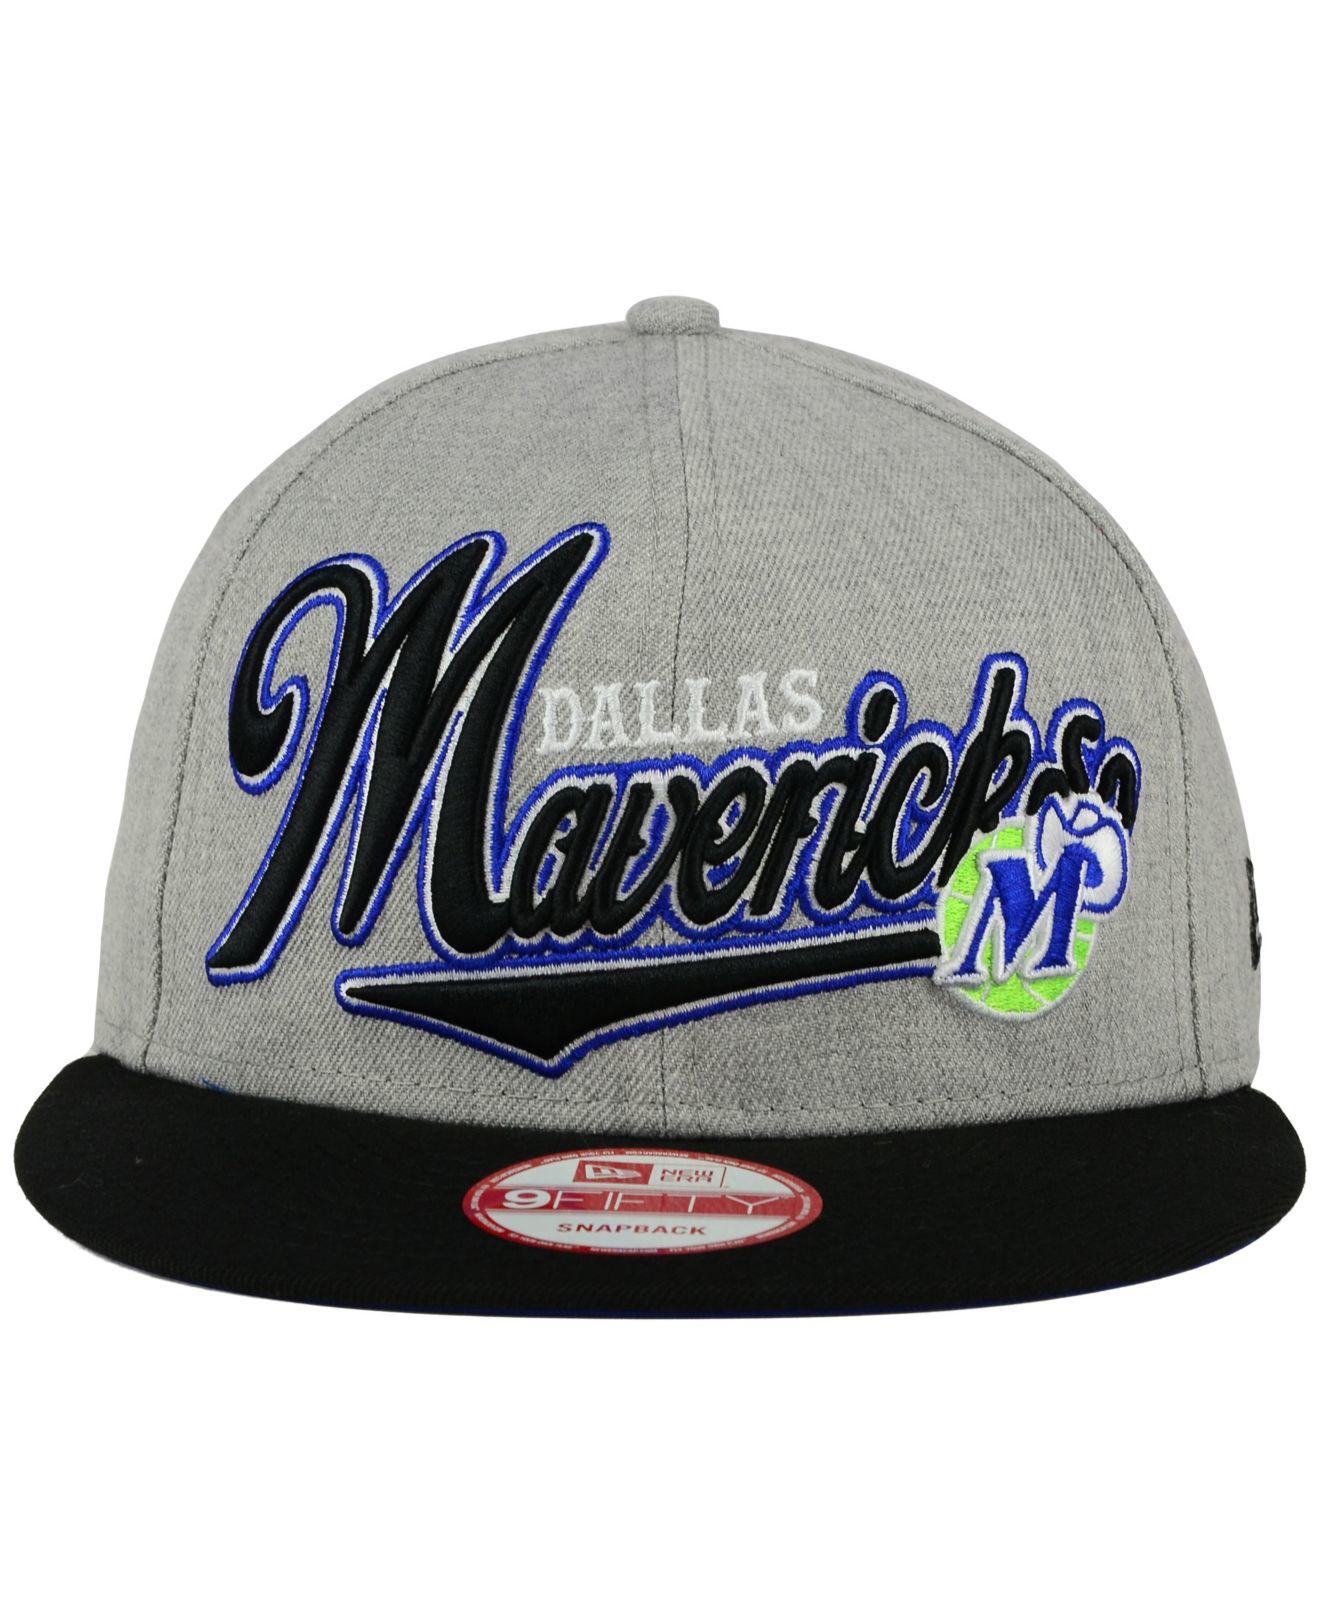 f30833112e344 Lyst - Ktz Dallas Mavericks Big Heather 9fifty Snapback Cap in Gray ...